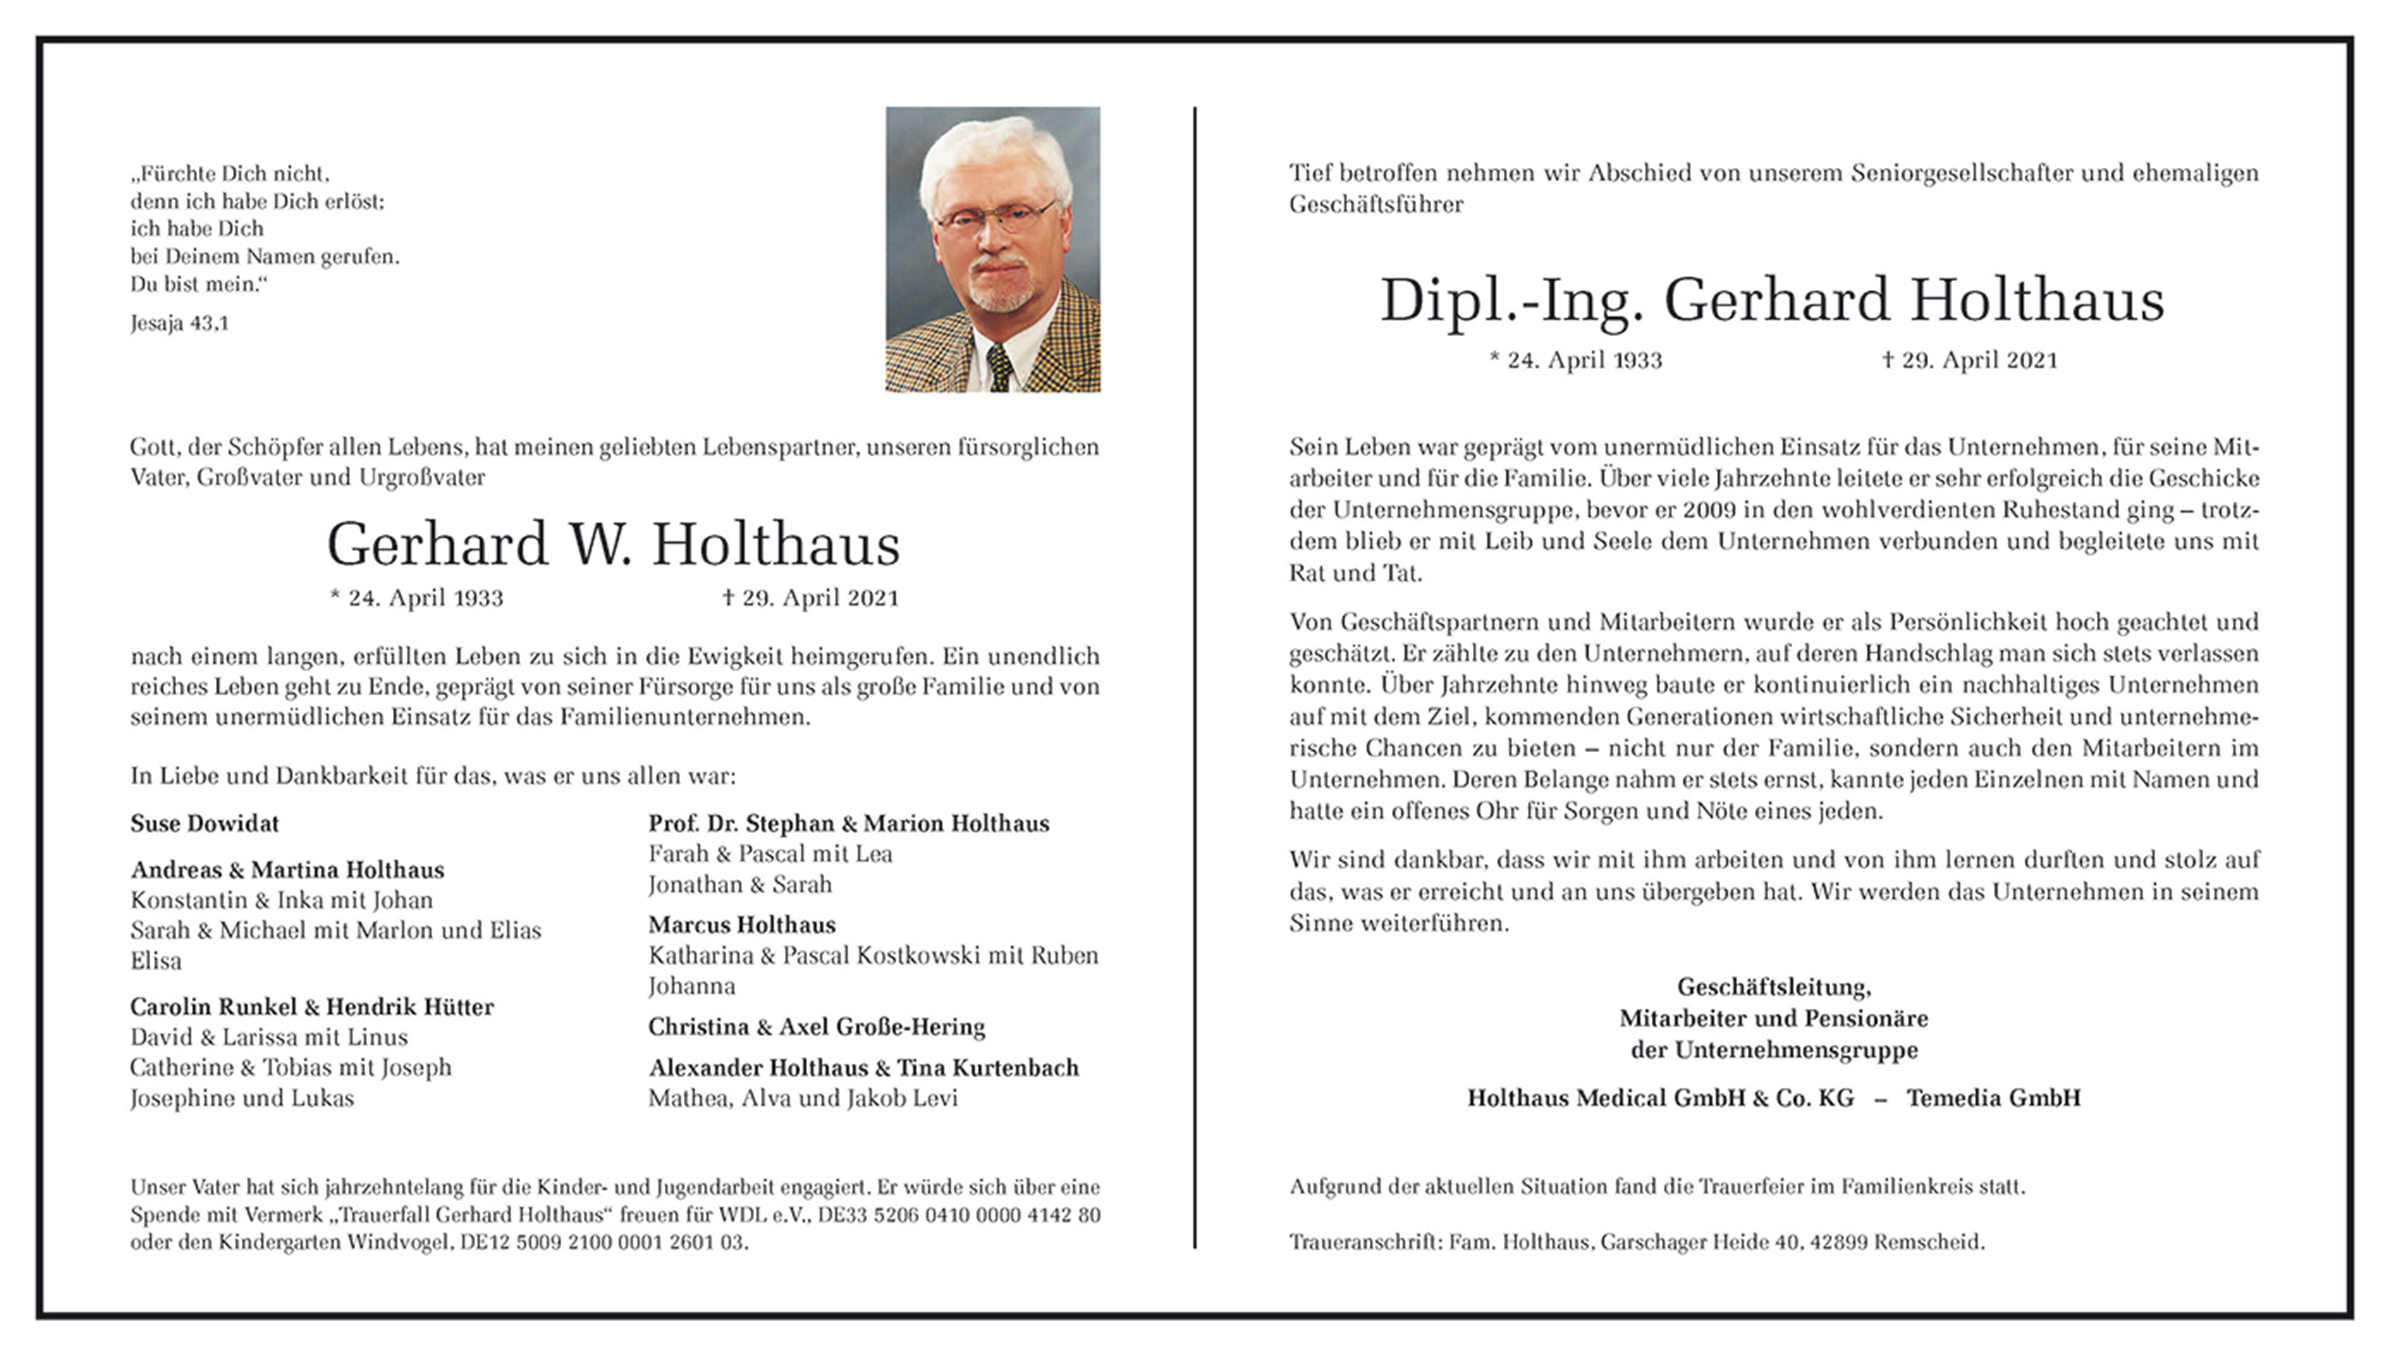 Gerhard W. Holthaus